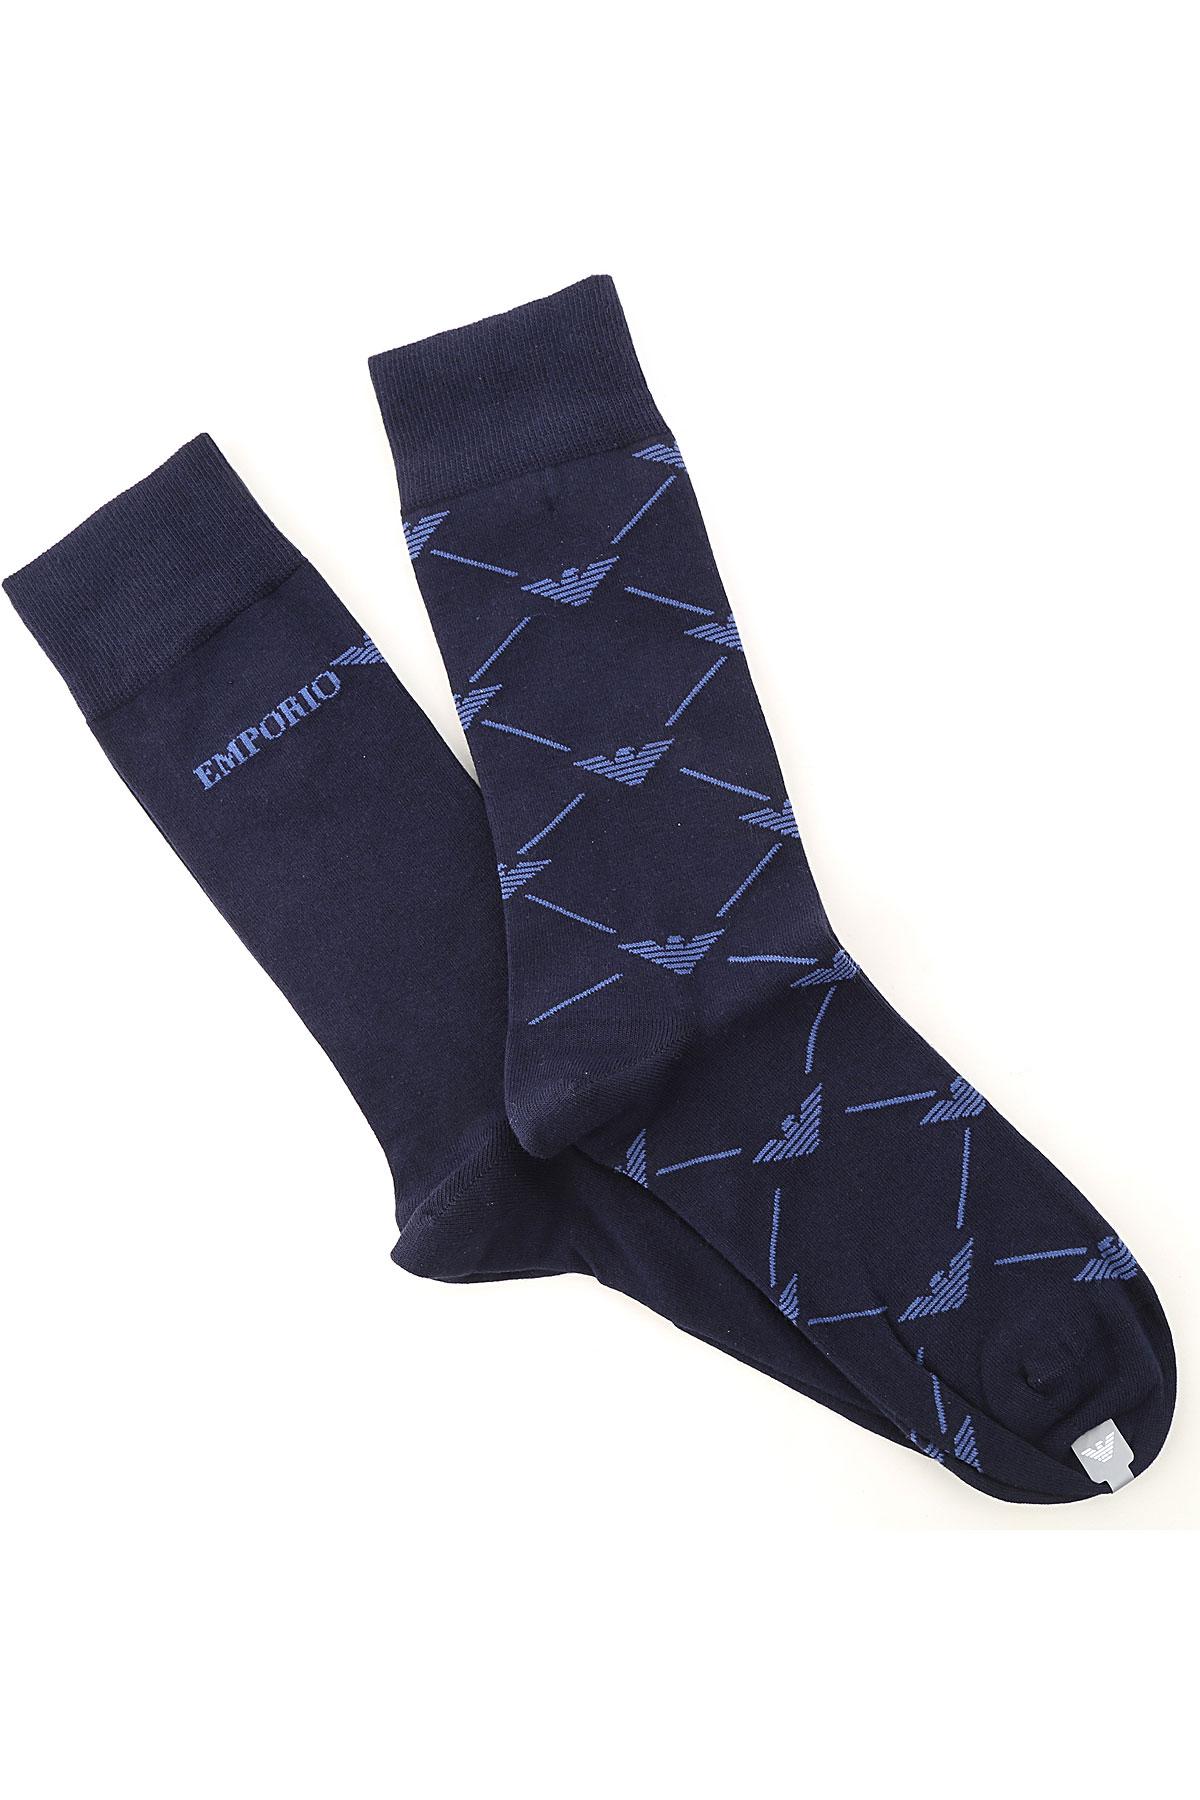 Emporio Armani Socks Socks for Men On Sale, 2 Pack, Dark Midnight Blue, Cotton, 2019